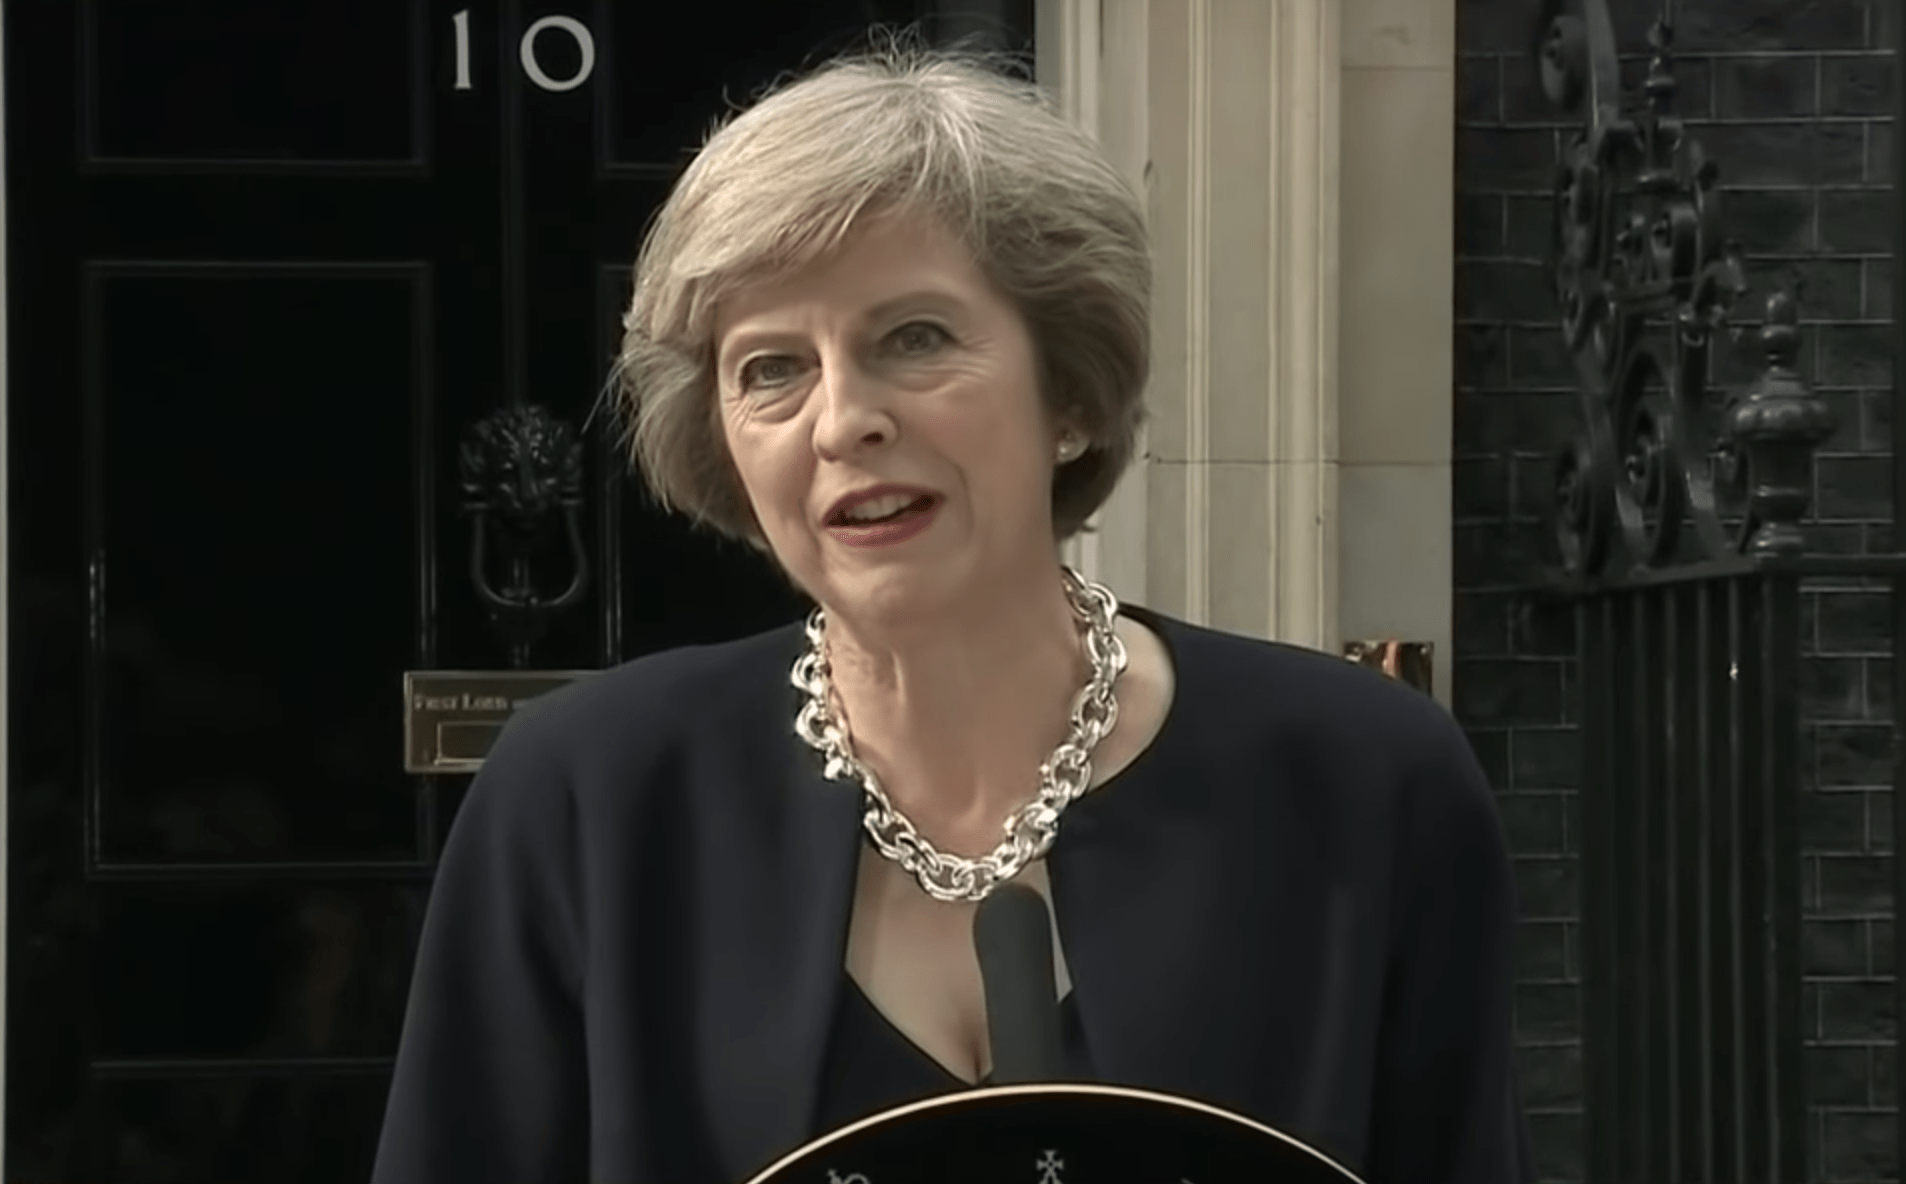 Theresa May expressed concern about eroding rights in Hong Kong. (Image: YouTube/Screenshot)